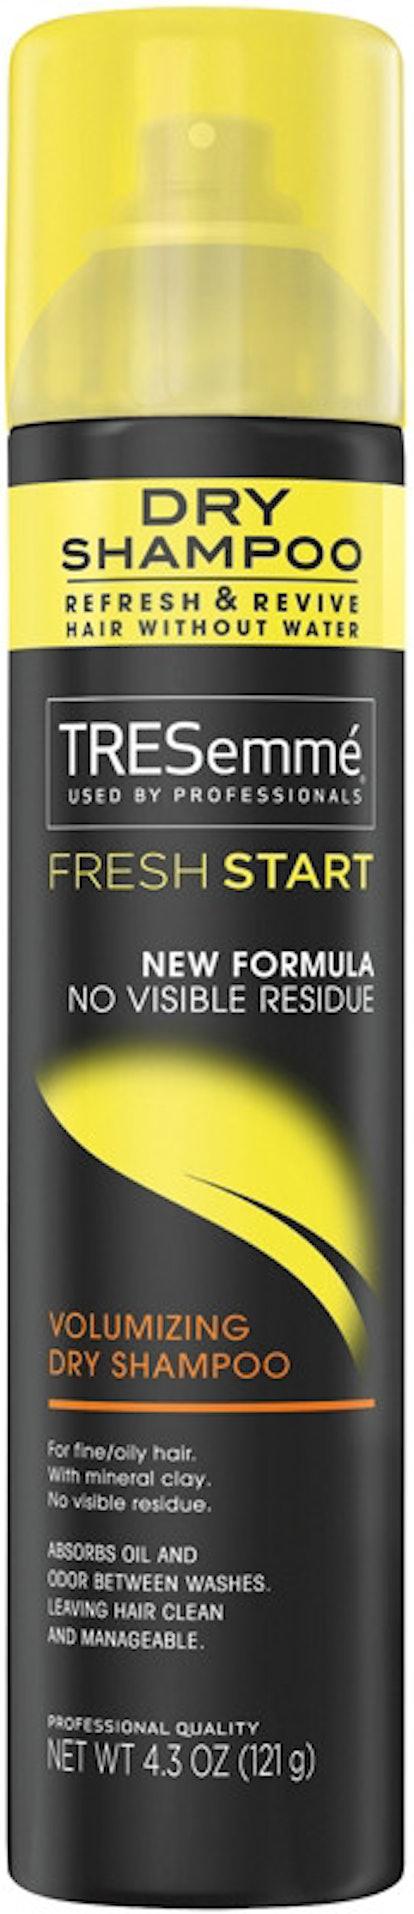 Tresemme Fresh Start Volumizing Dry Shampoo